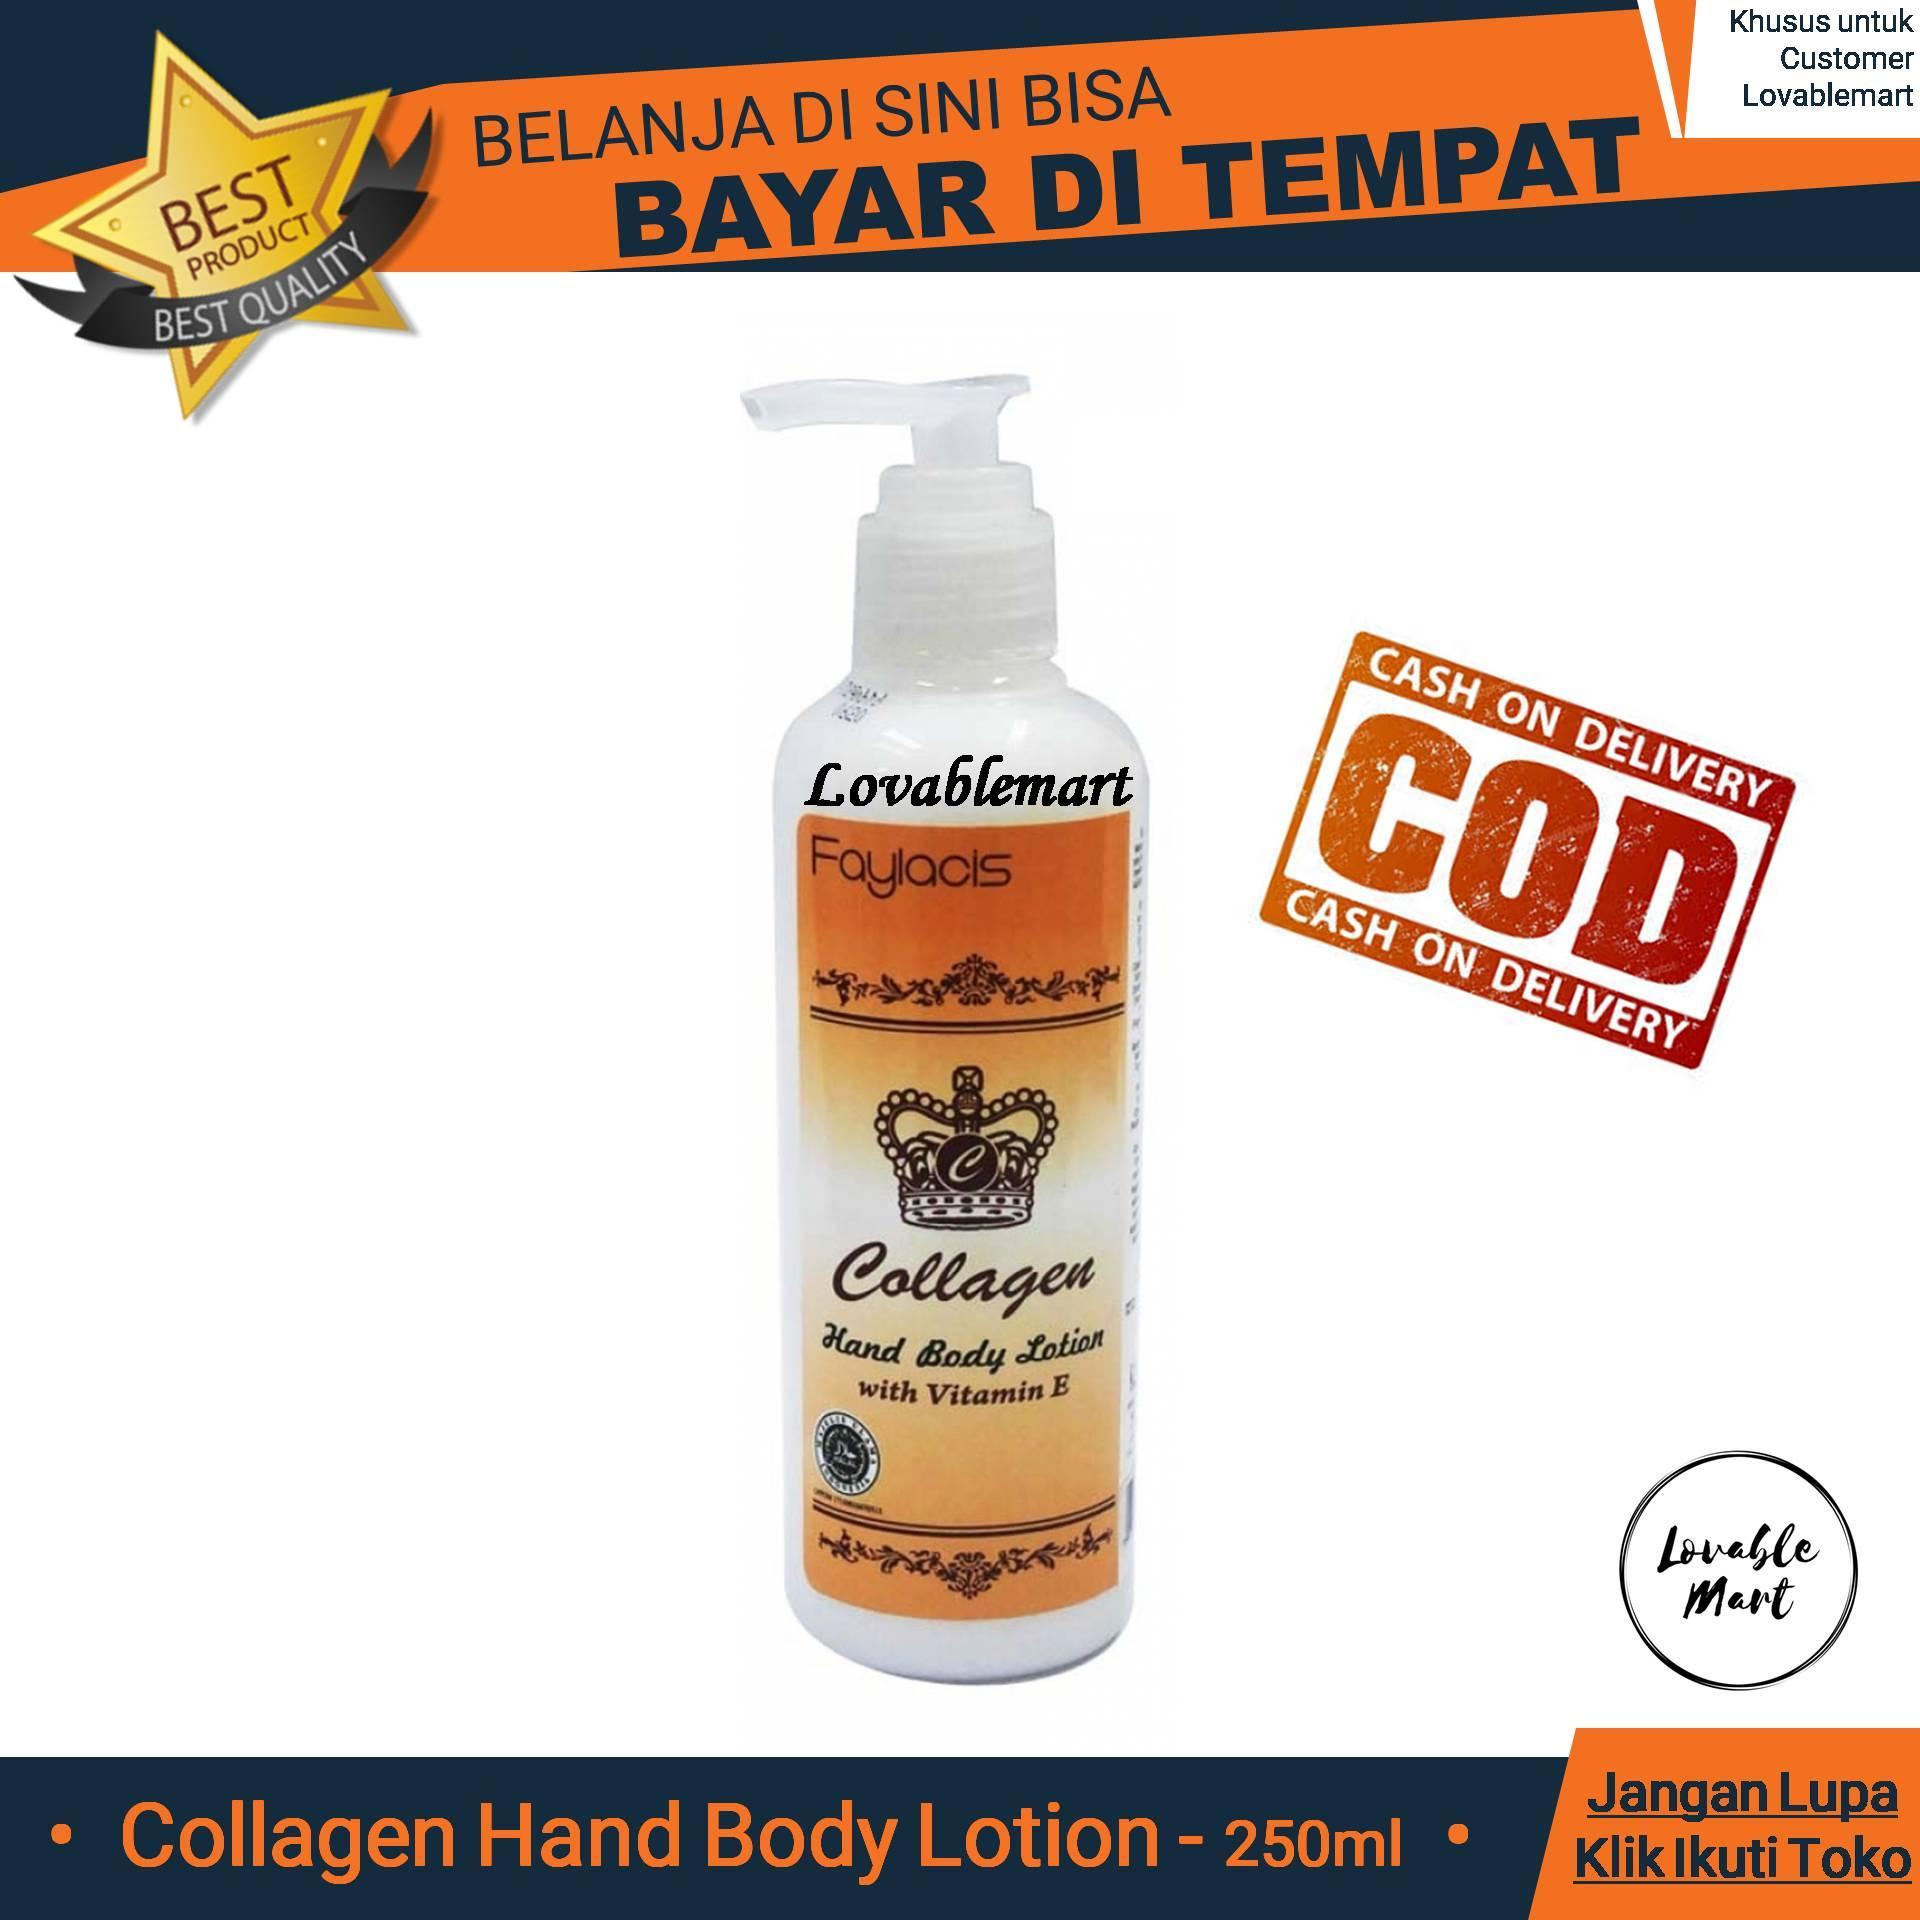 Collagen Hand Body Lotion 250ml - @Lovablemart Bisa COD Bayar di Tempat - Faylacis Colagen